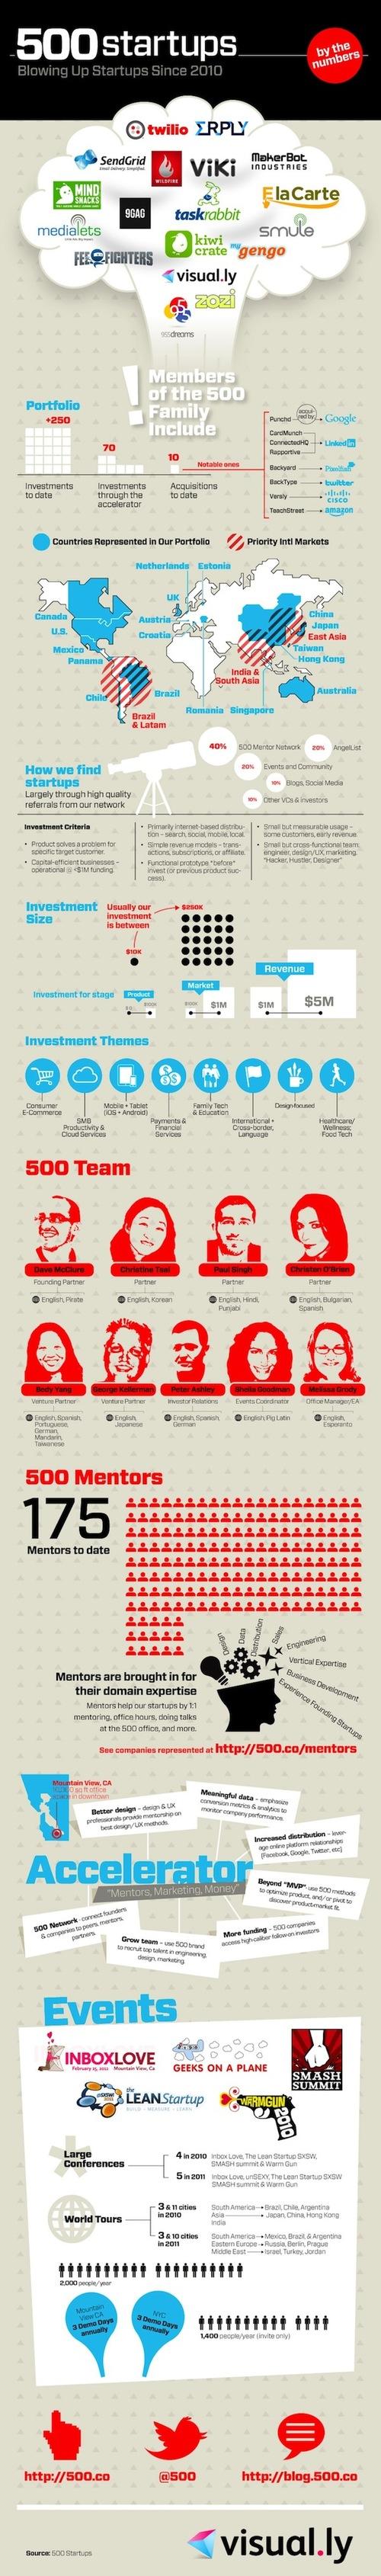 500 Startups_Infographic, marketingando